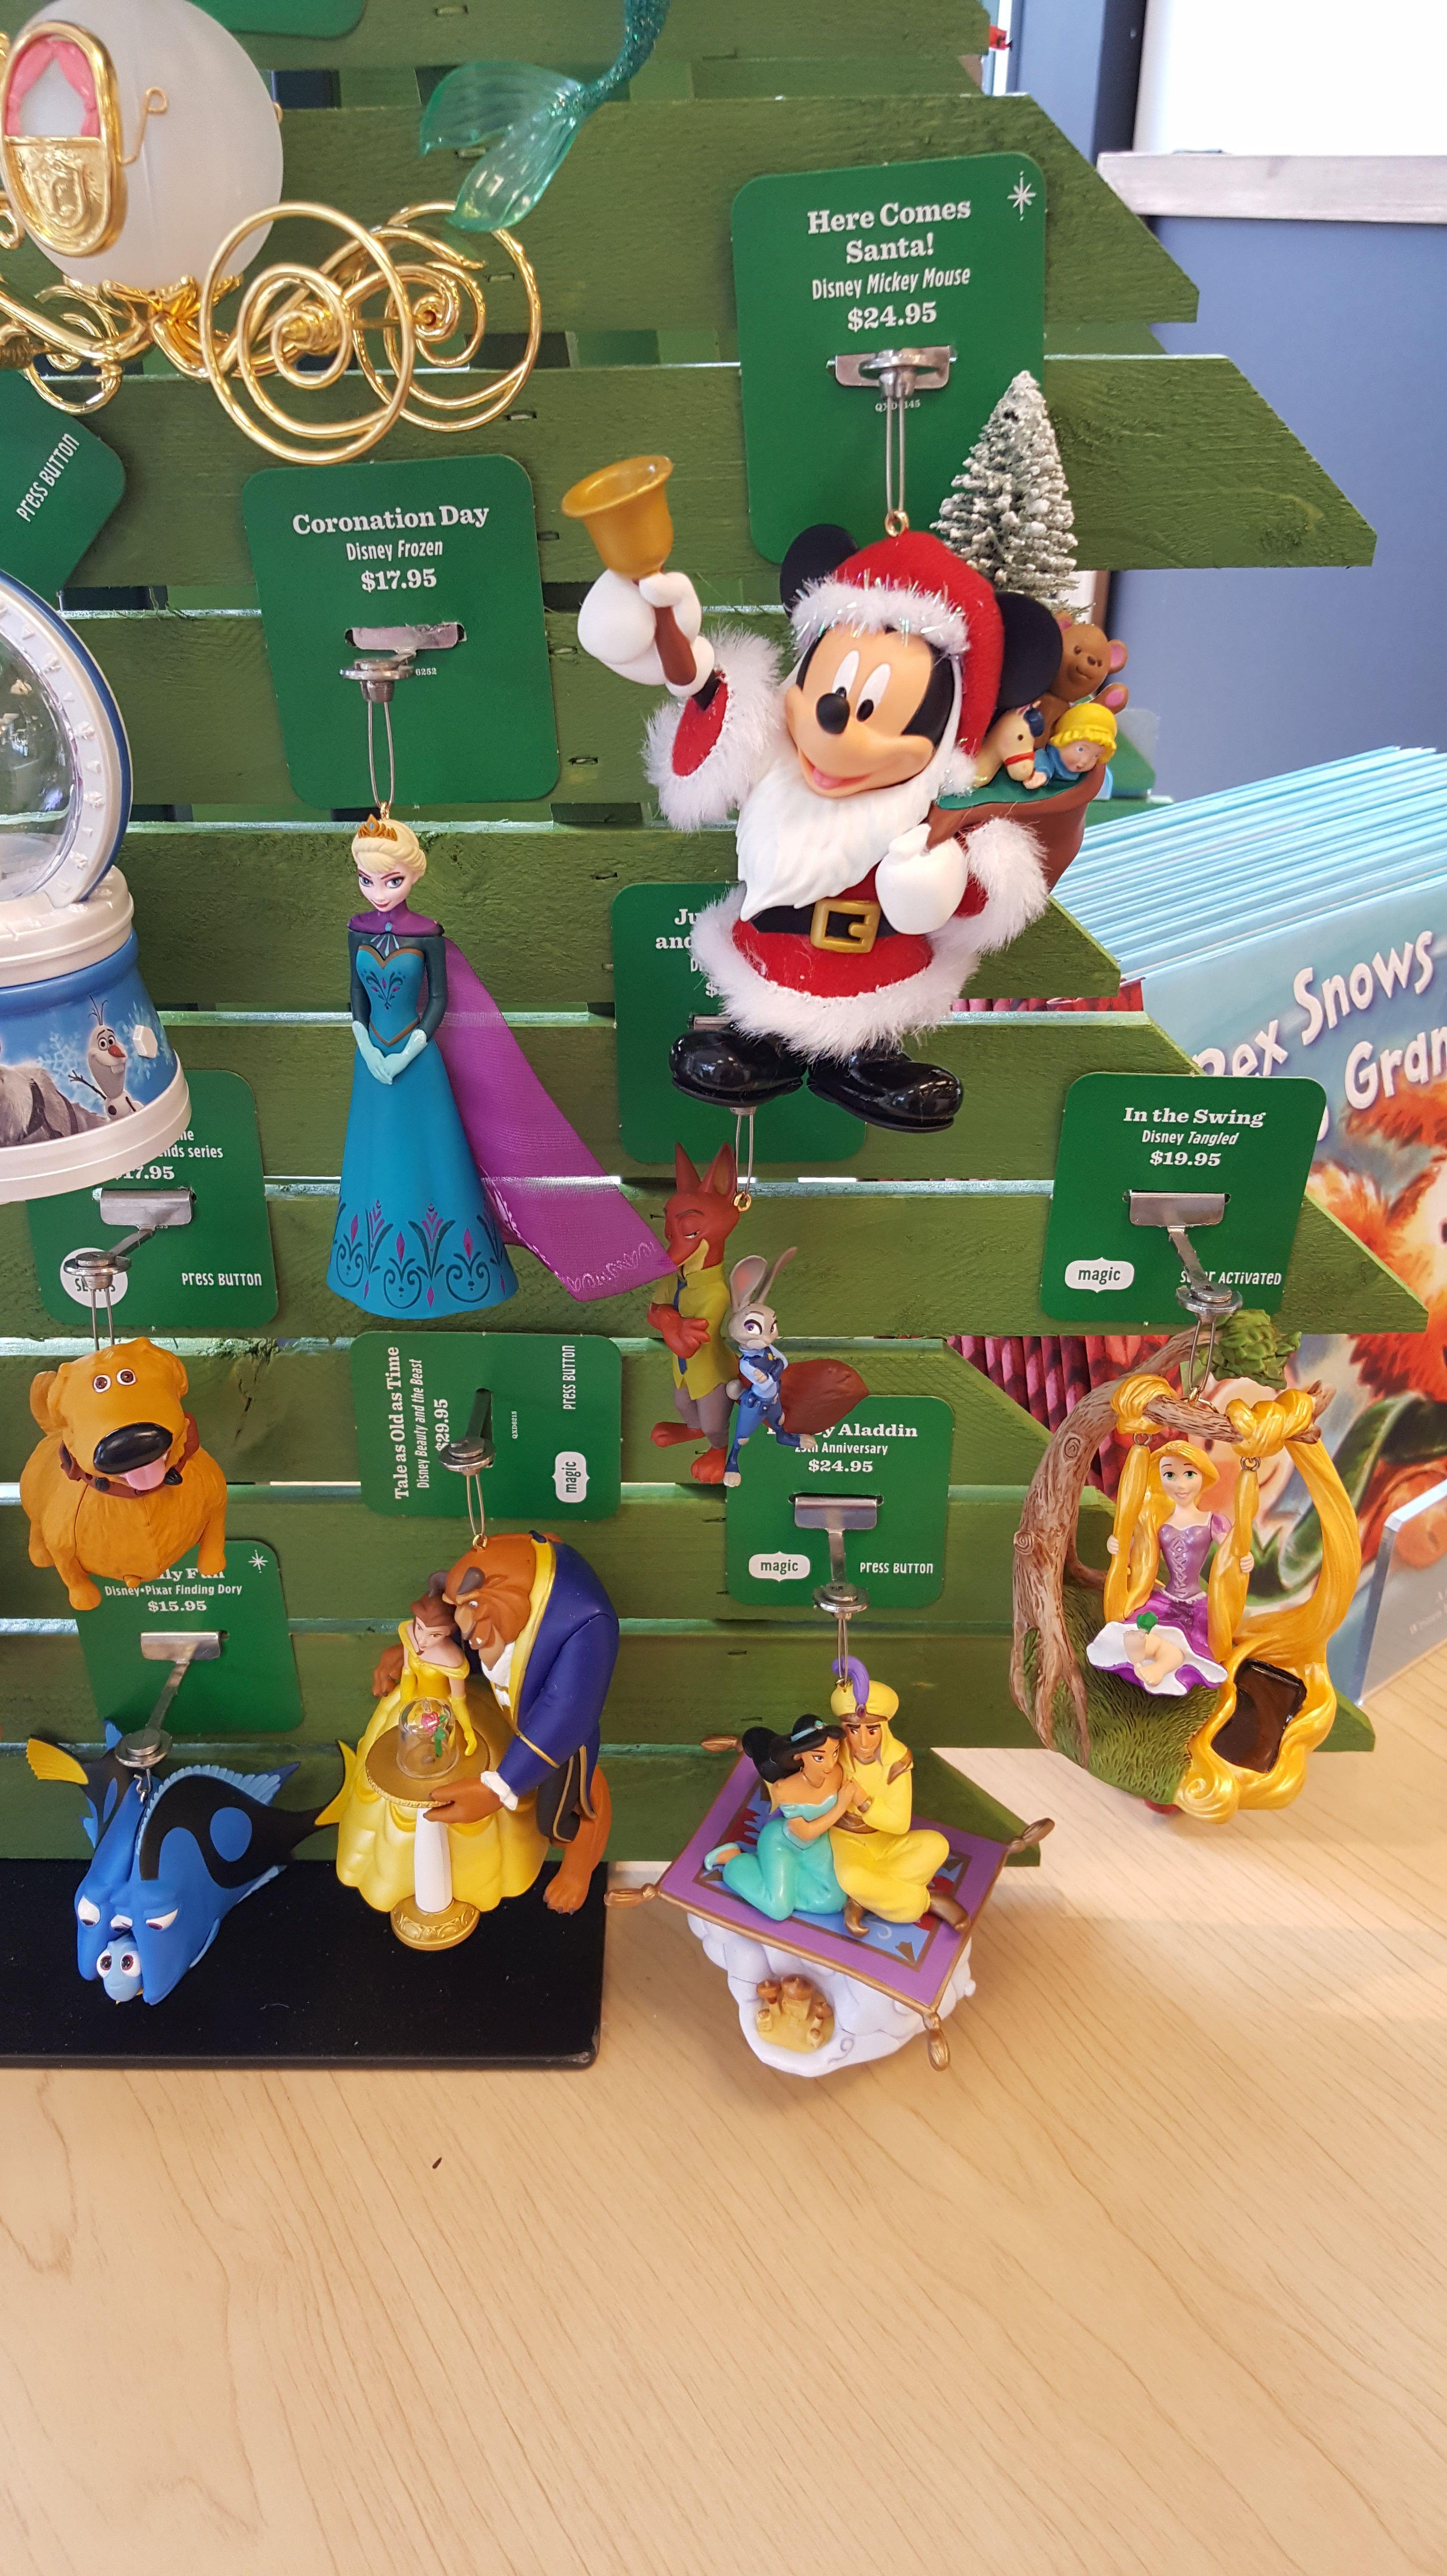 The Hallmark Disney Christmas Ornament Debut Is Here Disney Christmas Ornaments Disney Christmas Disney Ornaments